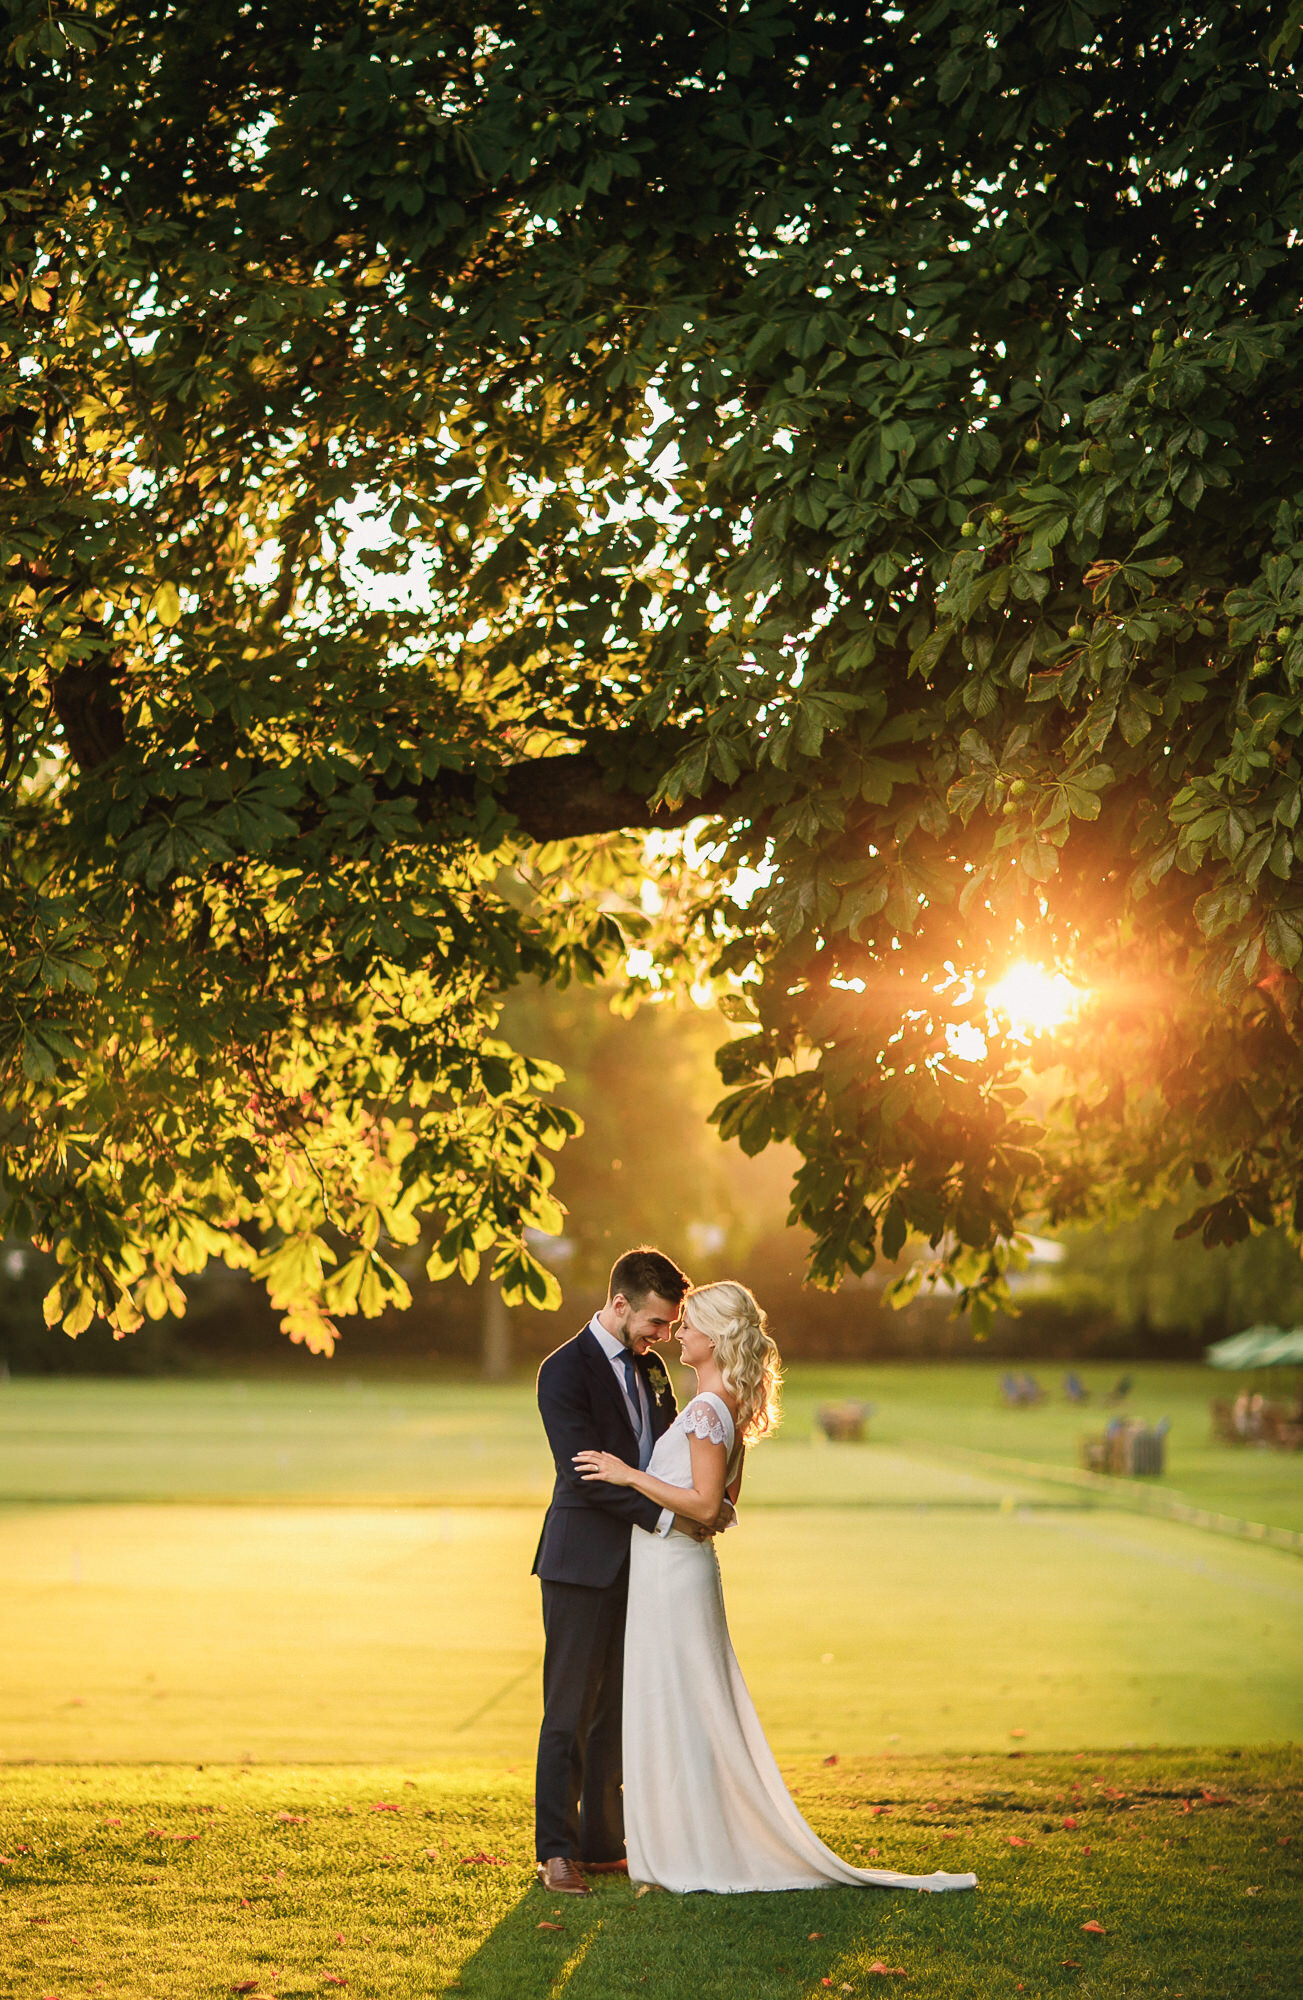 Dorset wedding photographers 088.jpg